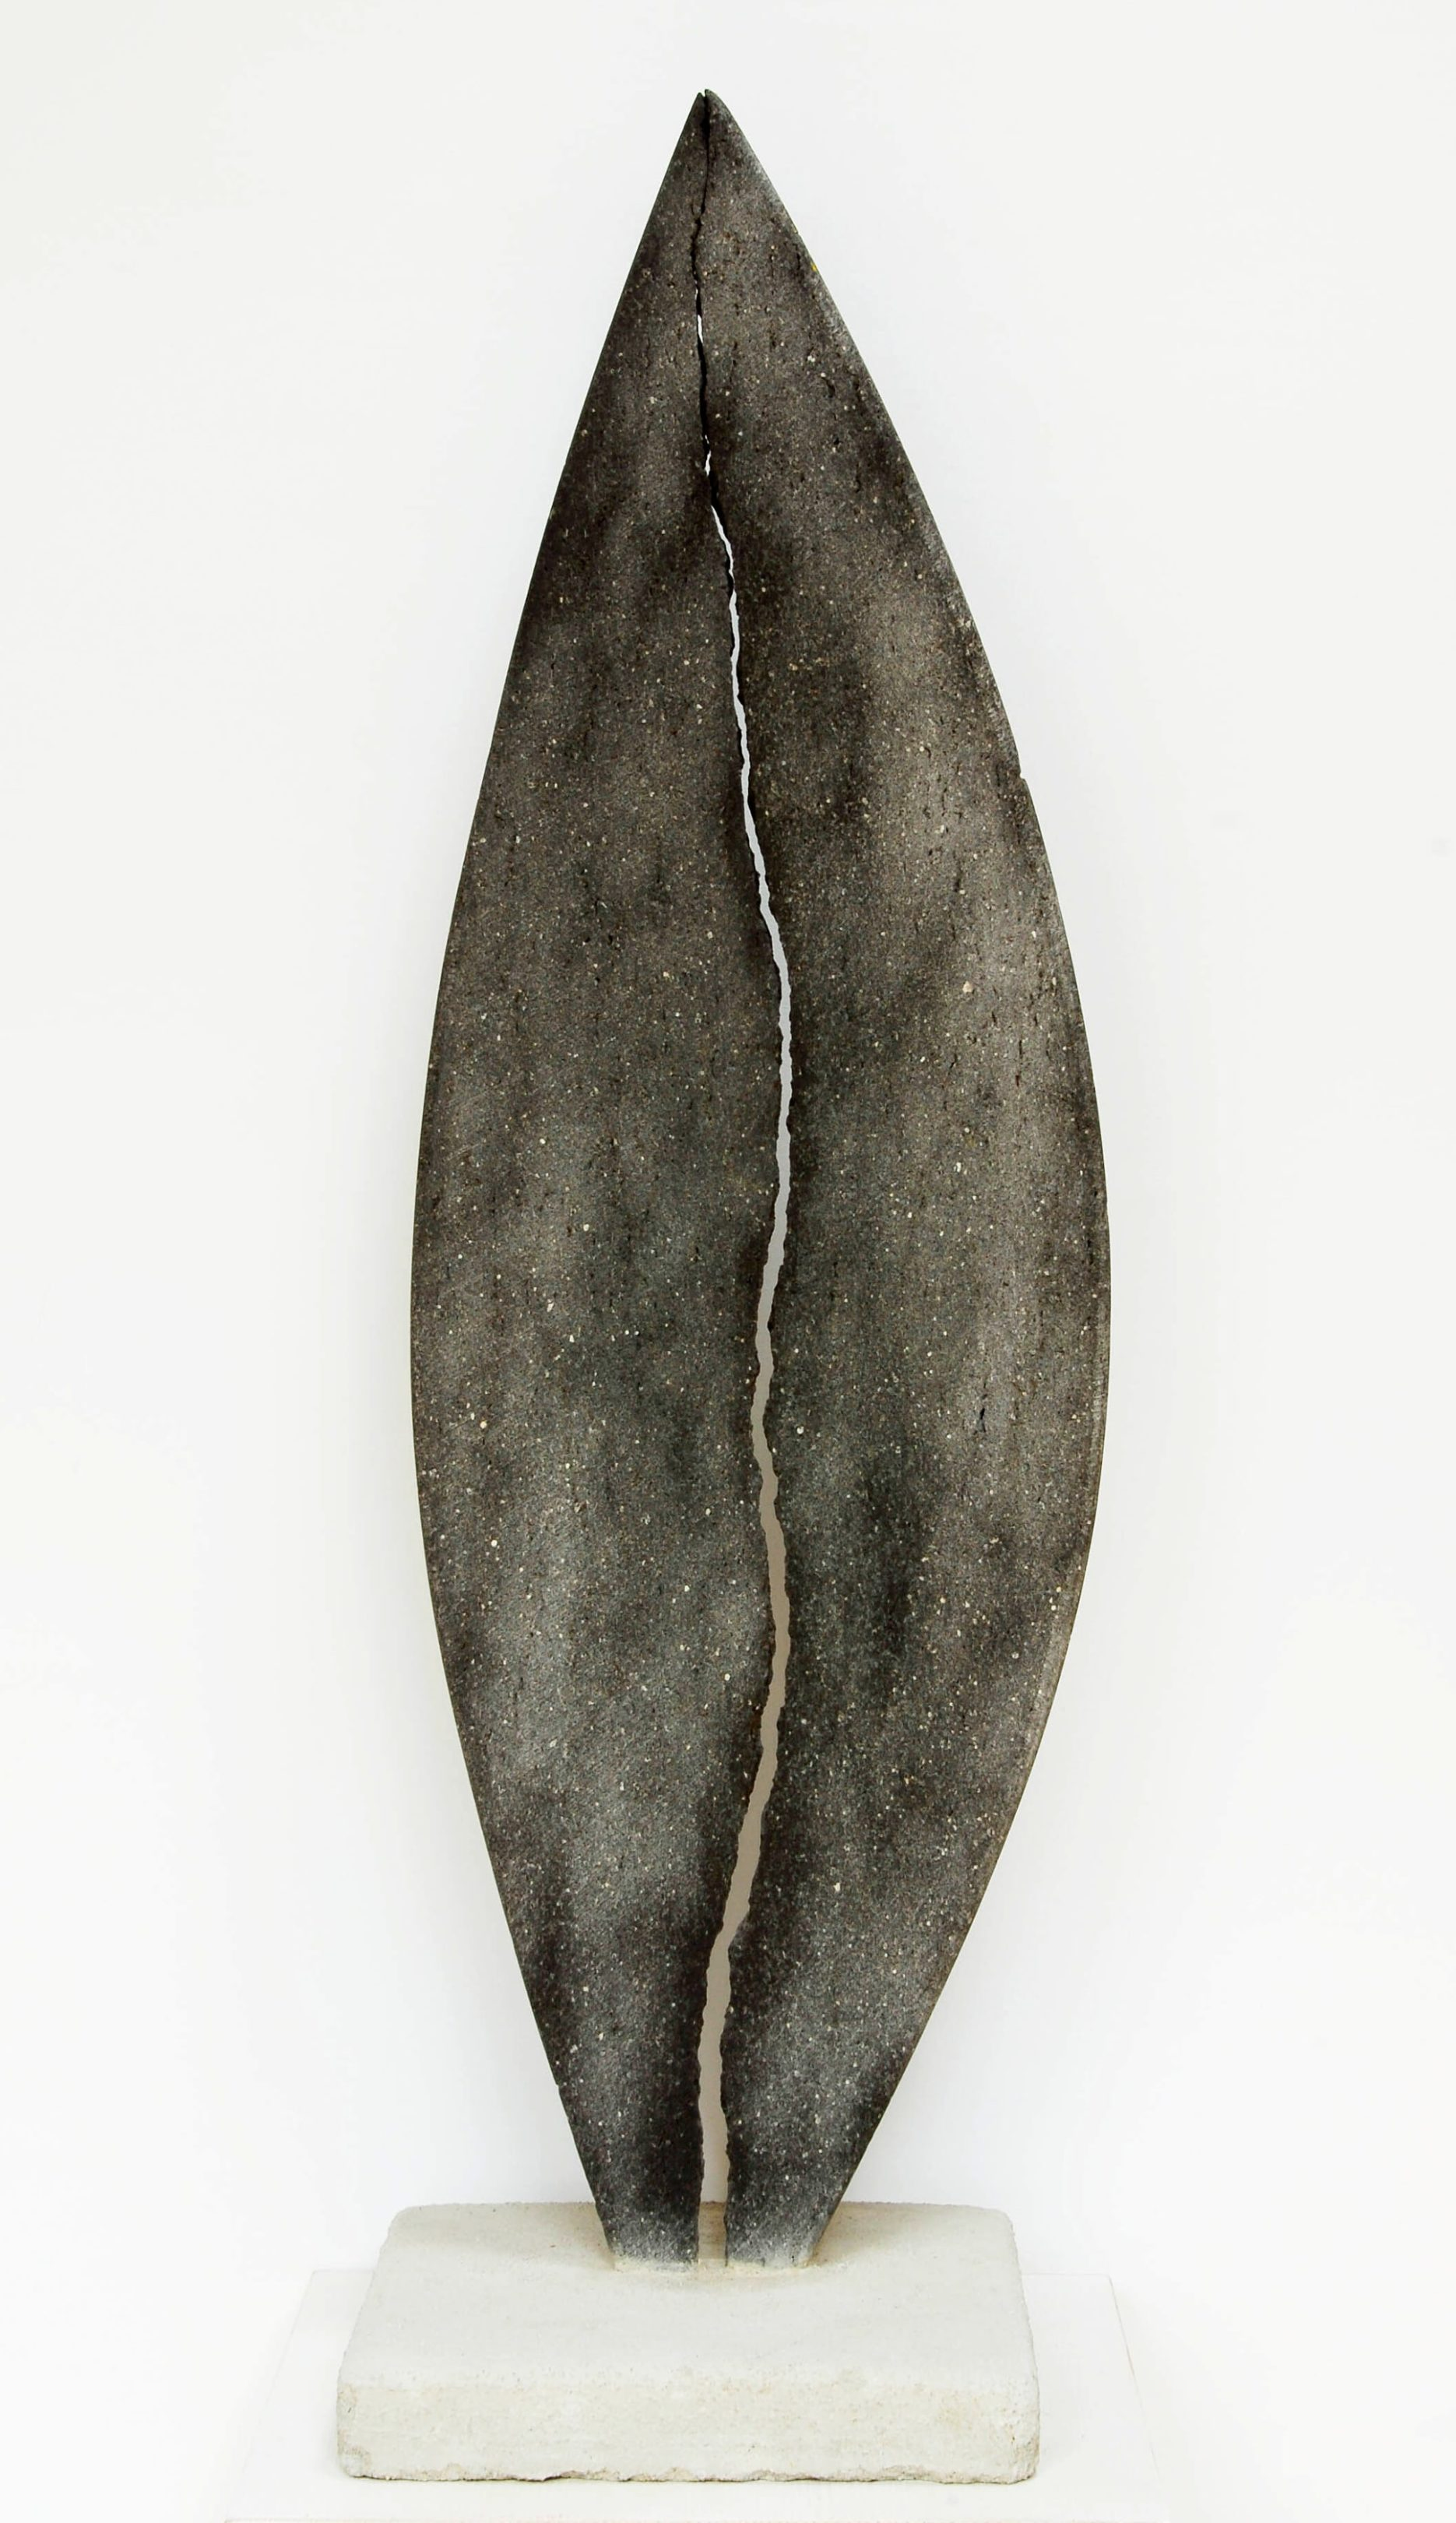 Objekt 0,80 x 0,30m – Basalt (2013)